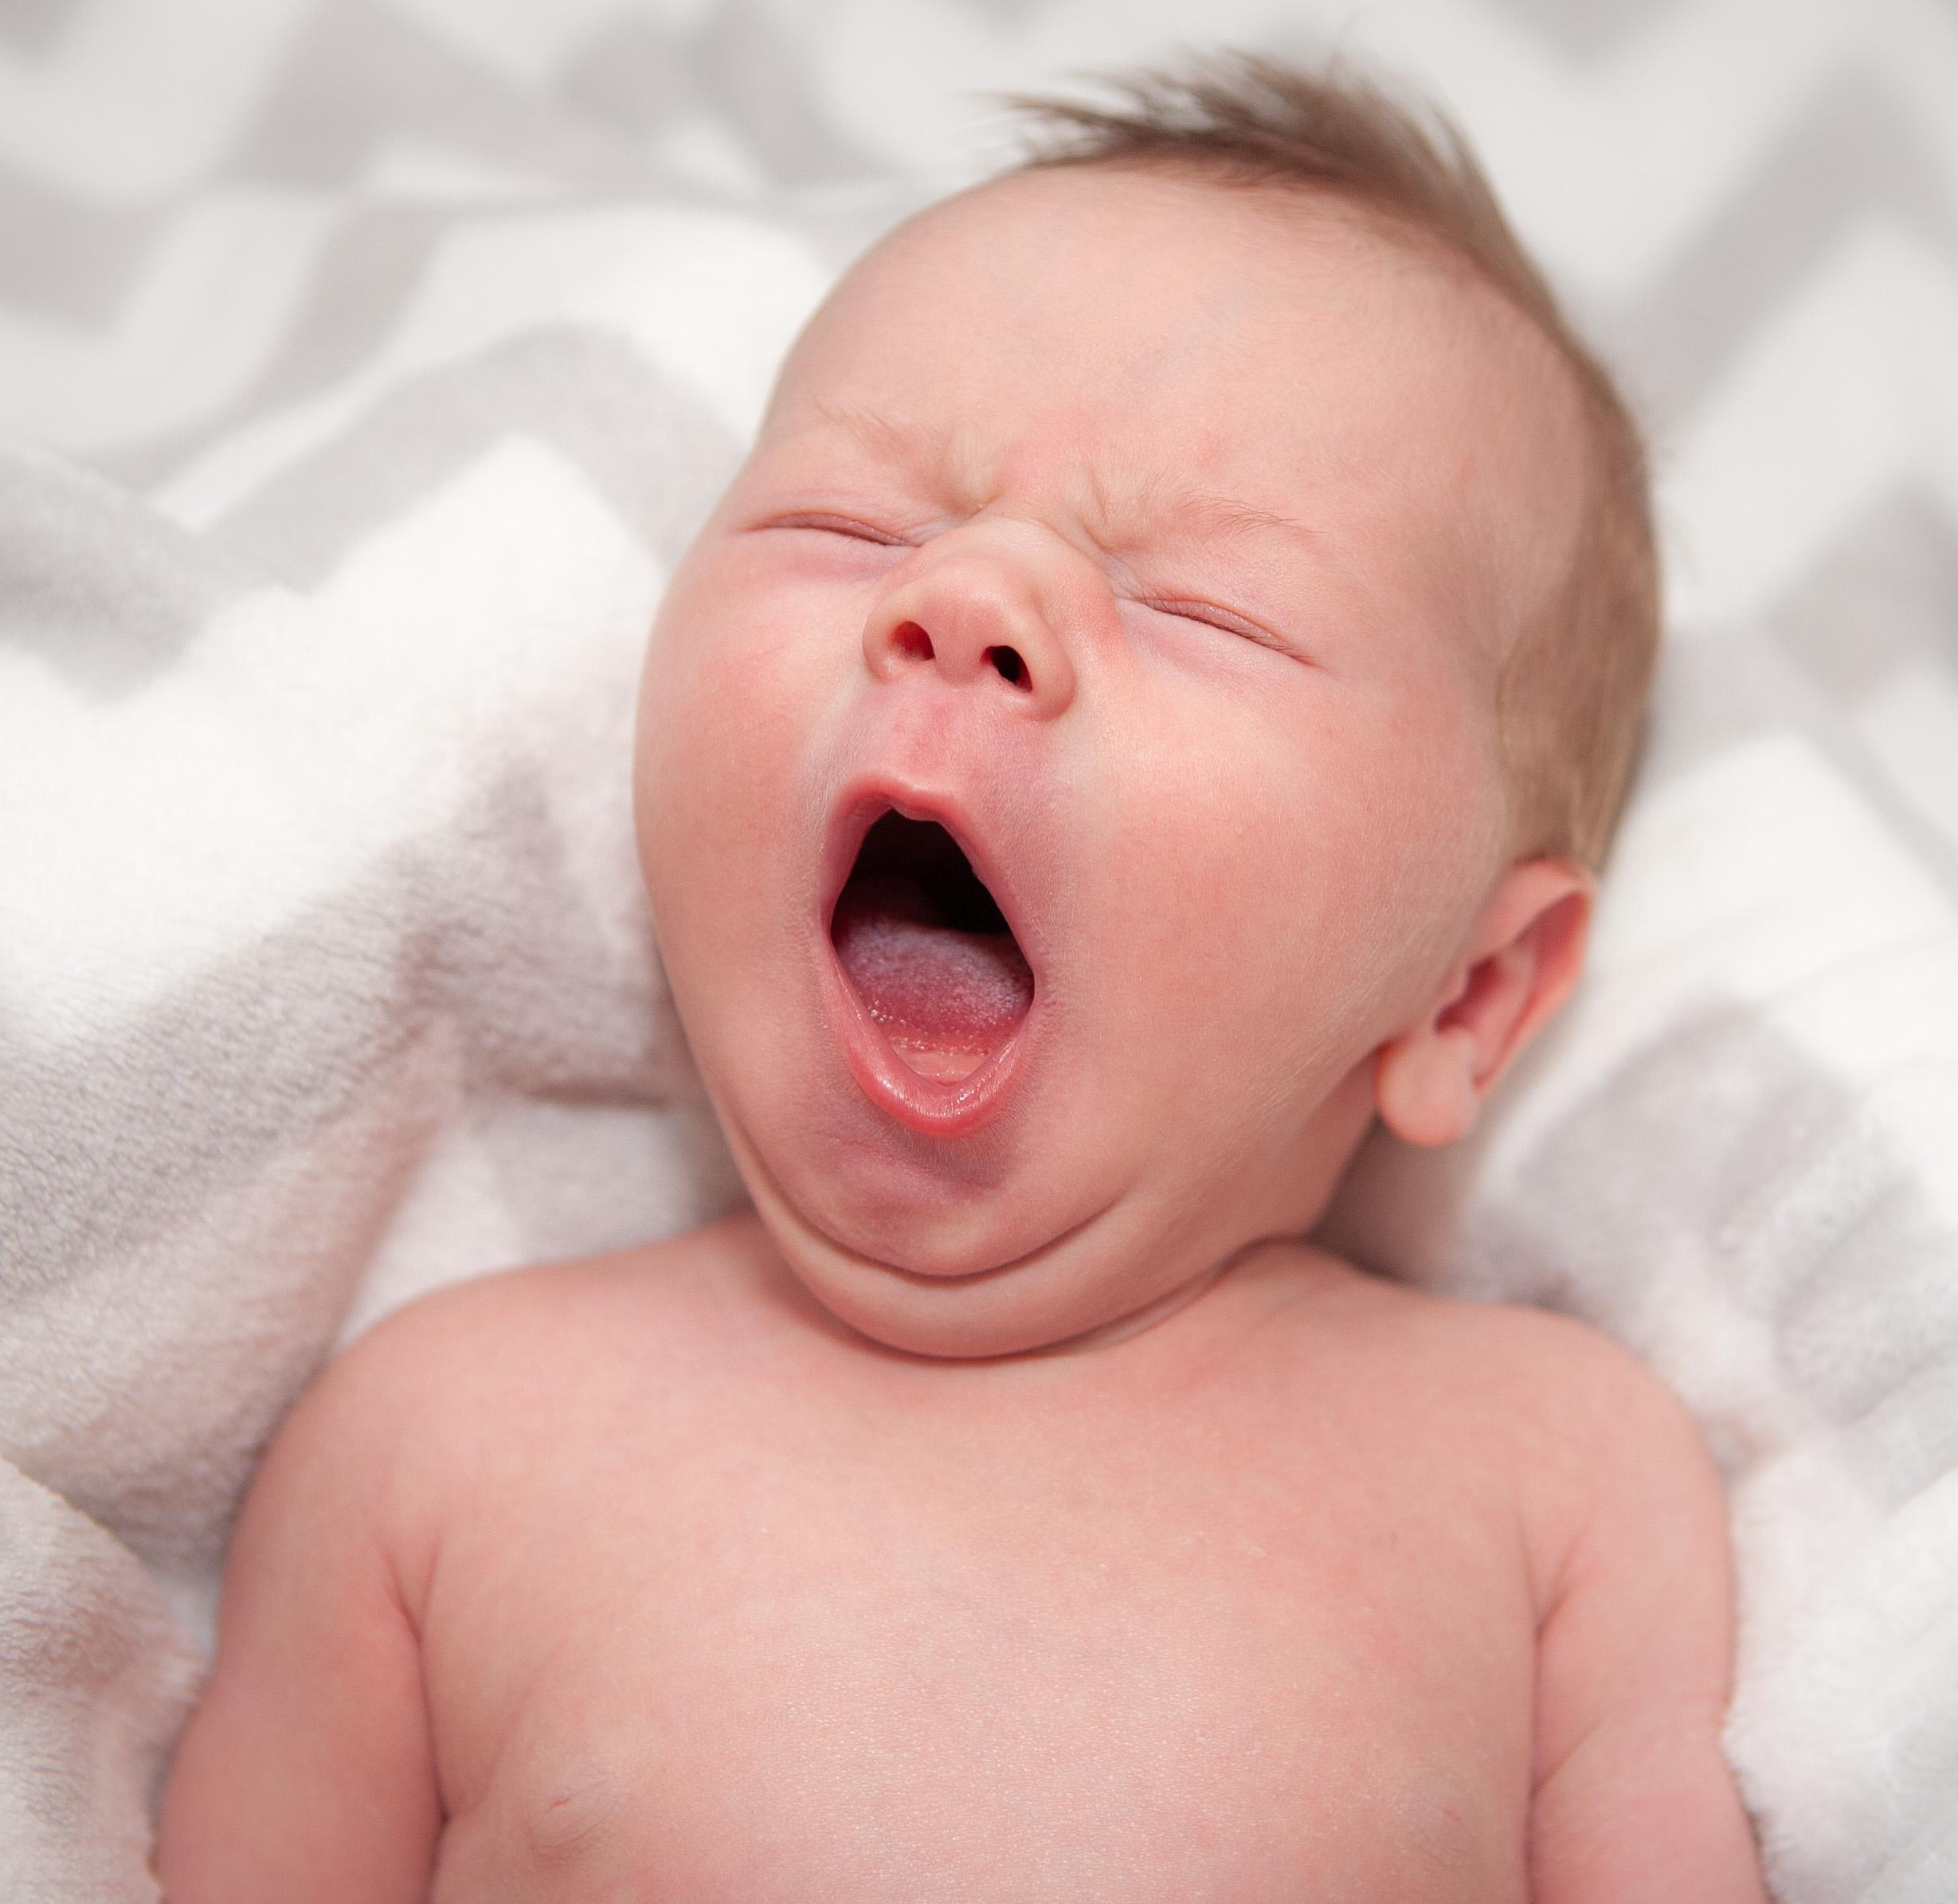 Newborn Lifstyle Session 1